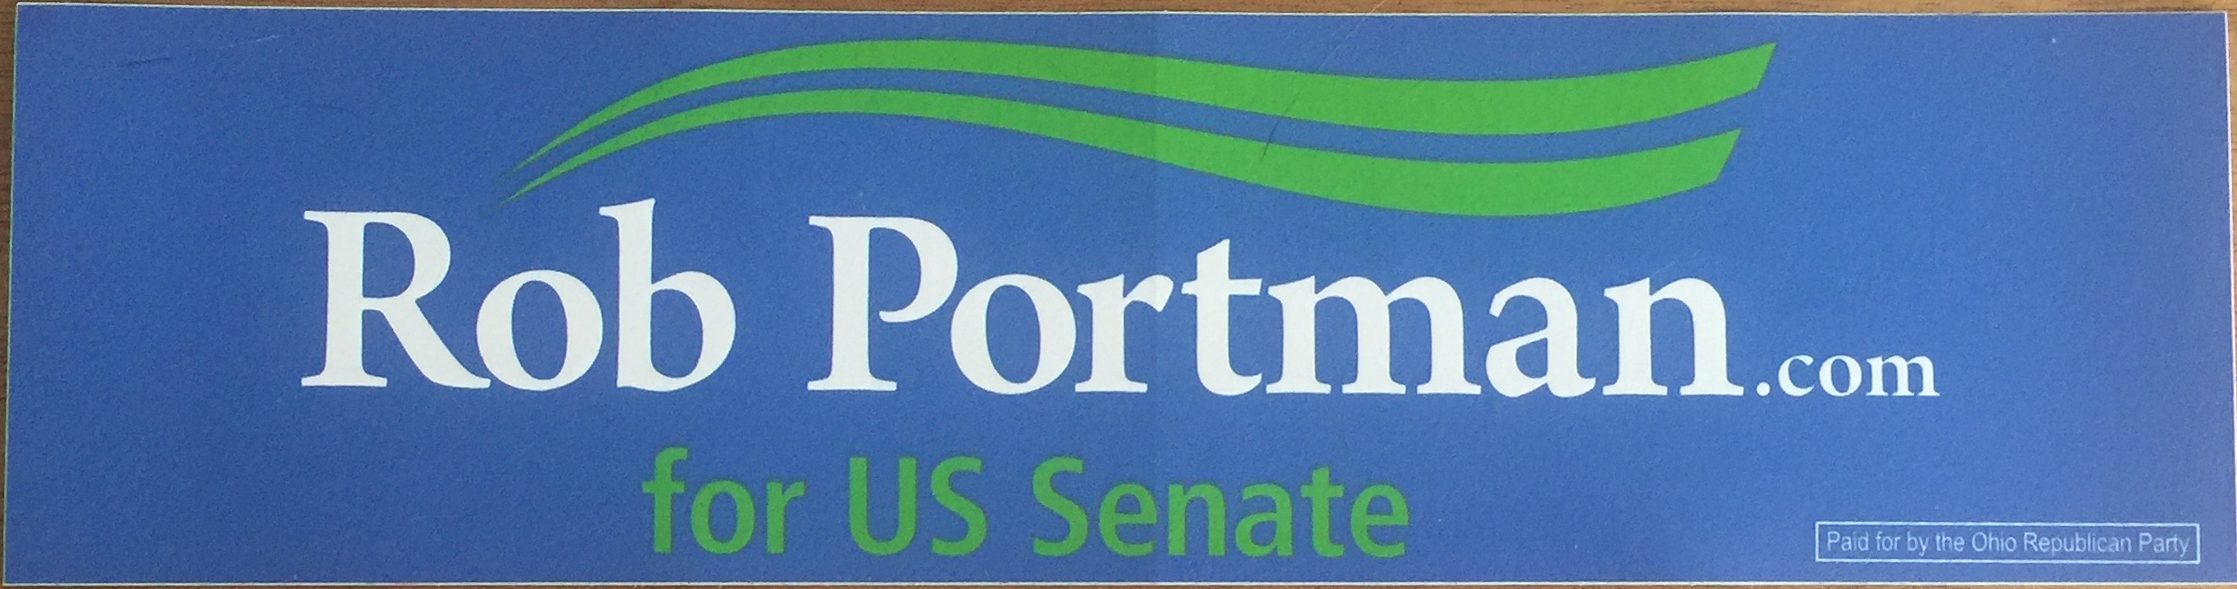 Sticker-uss PORTMAN 2016 3.jpg